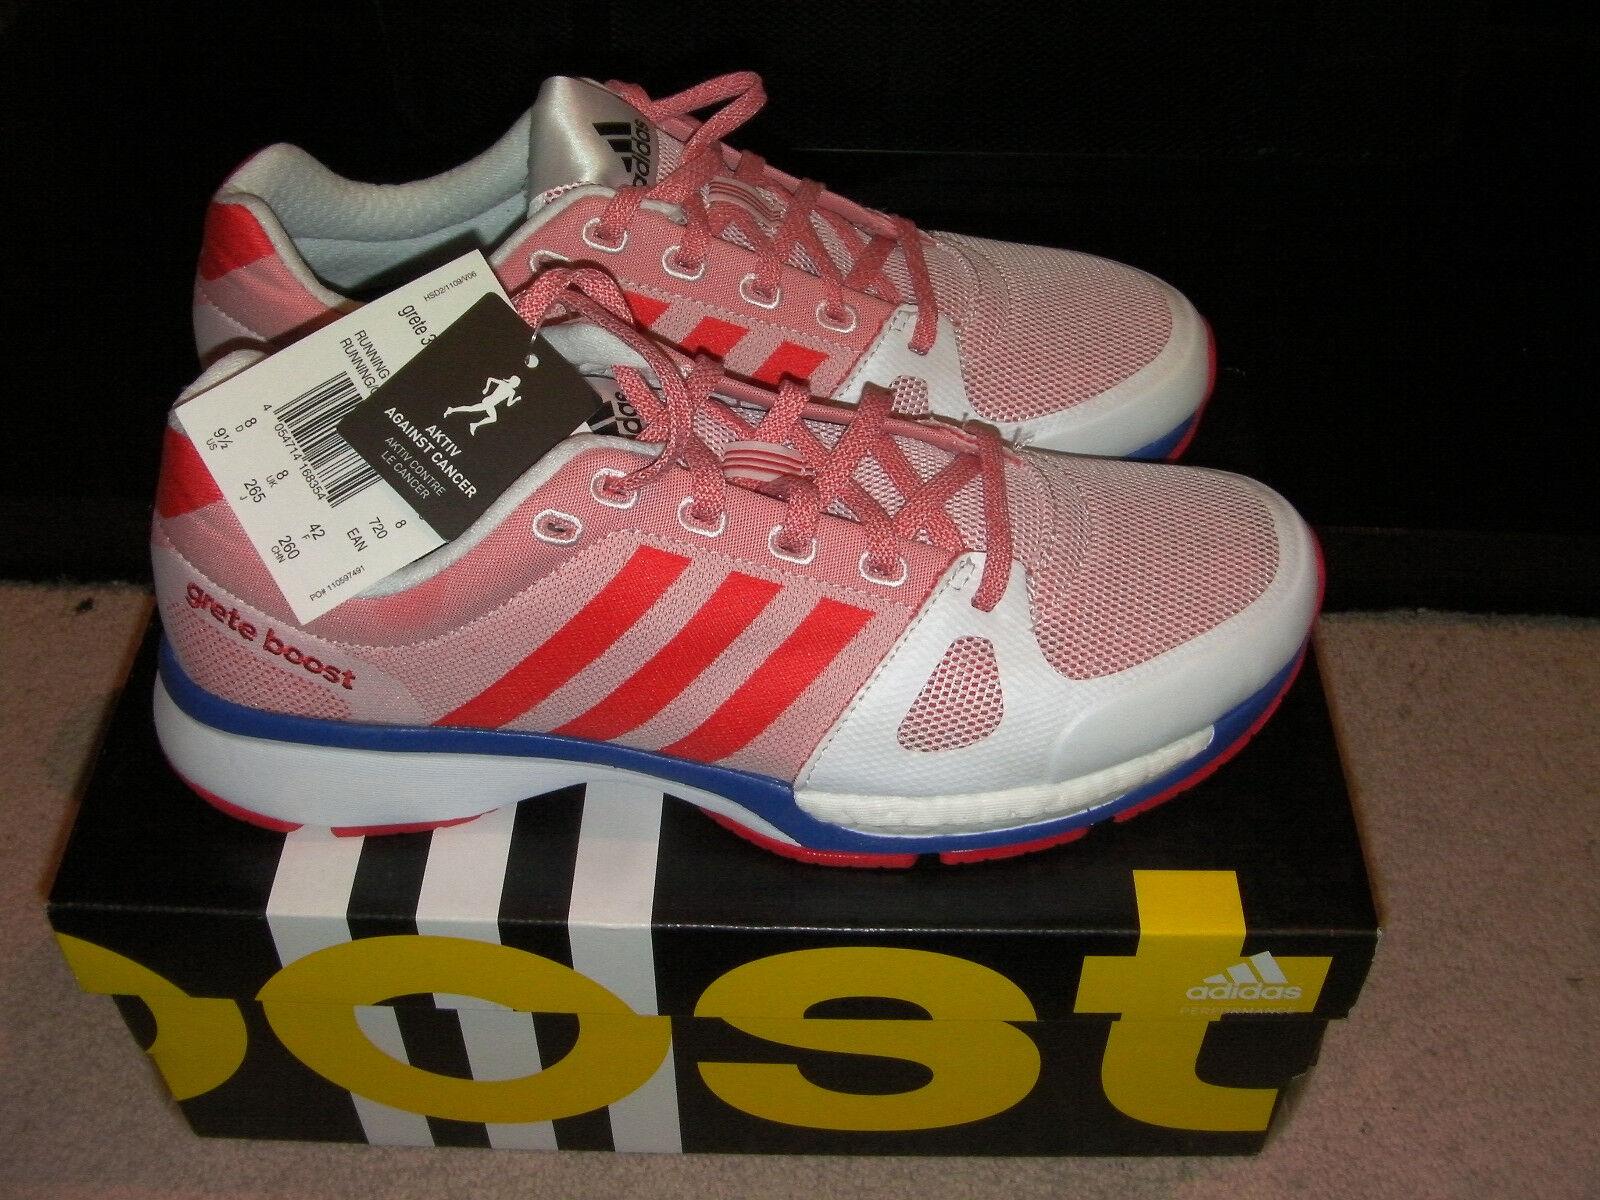 Adidas Greta 30 Boost Femmes Running Baskets-Blanc/Rouge/ROYAL - 8UK/42 UE